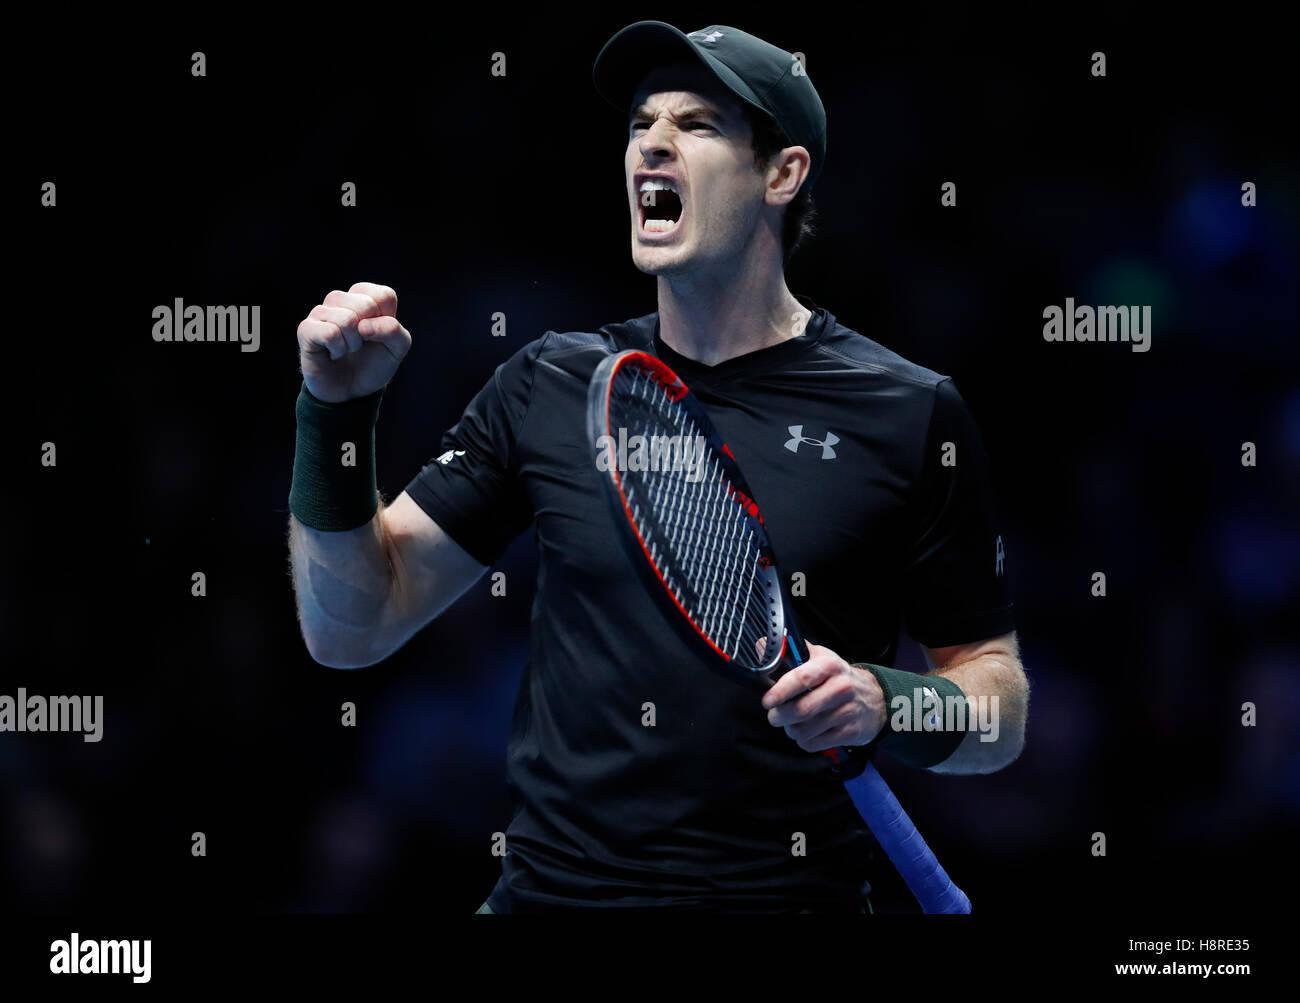 London, Großbritannien. 16. November 2016. Andy Murray aus Großbritannien reagiert auf 16. November 2016 Stockbild